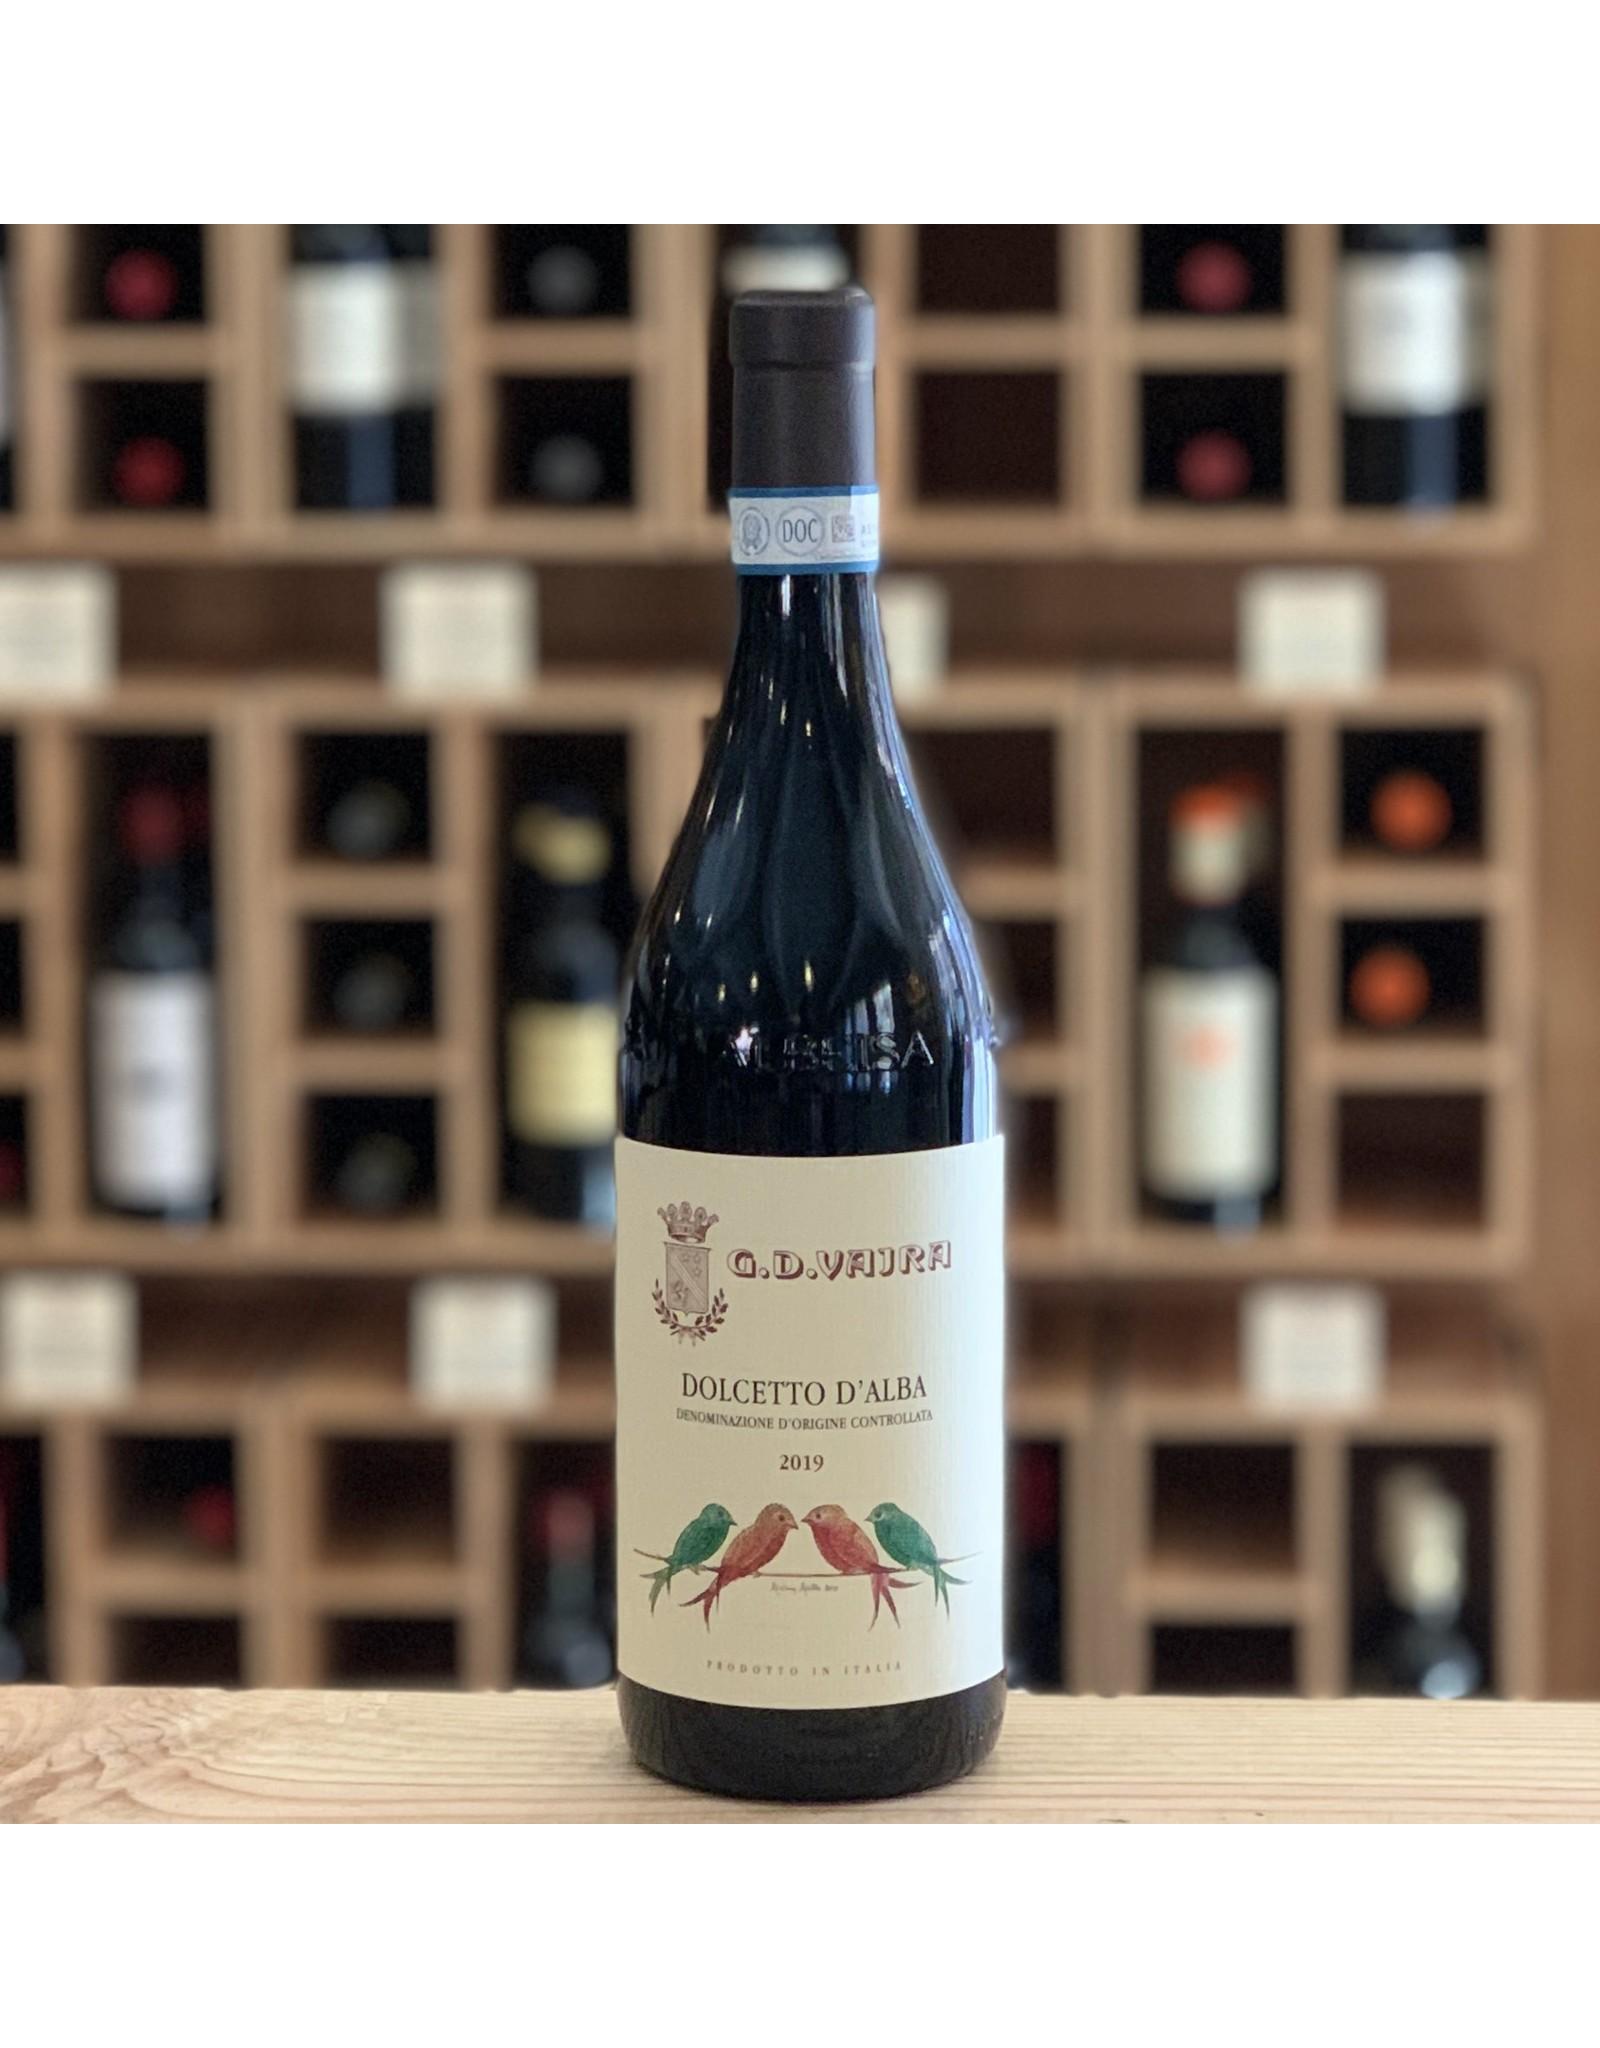 Vegan GD Vajra Dolcetto D'Alba 2019 - Piedmont, Italy